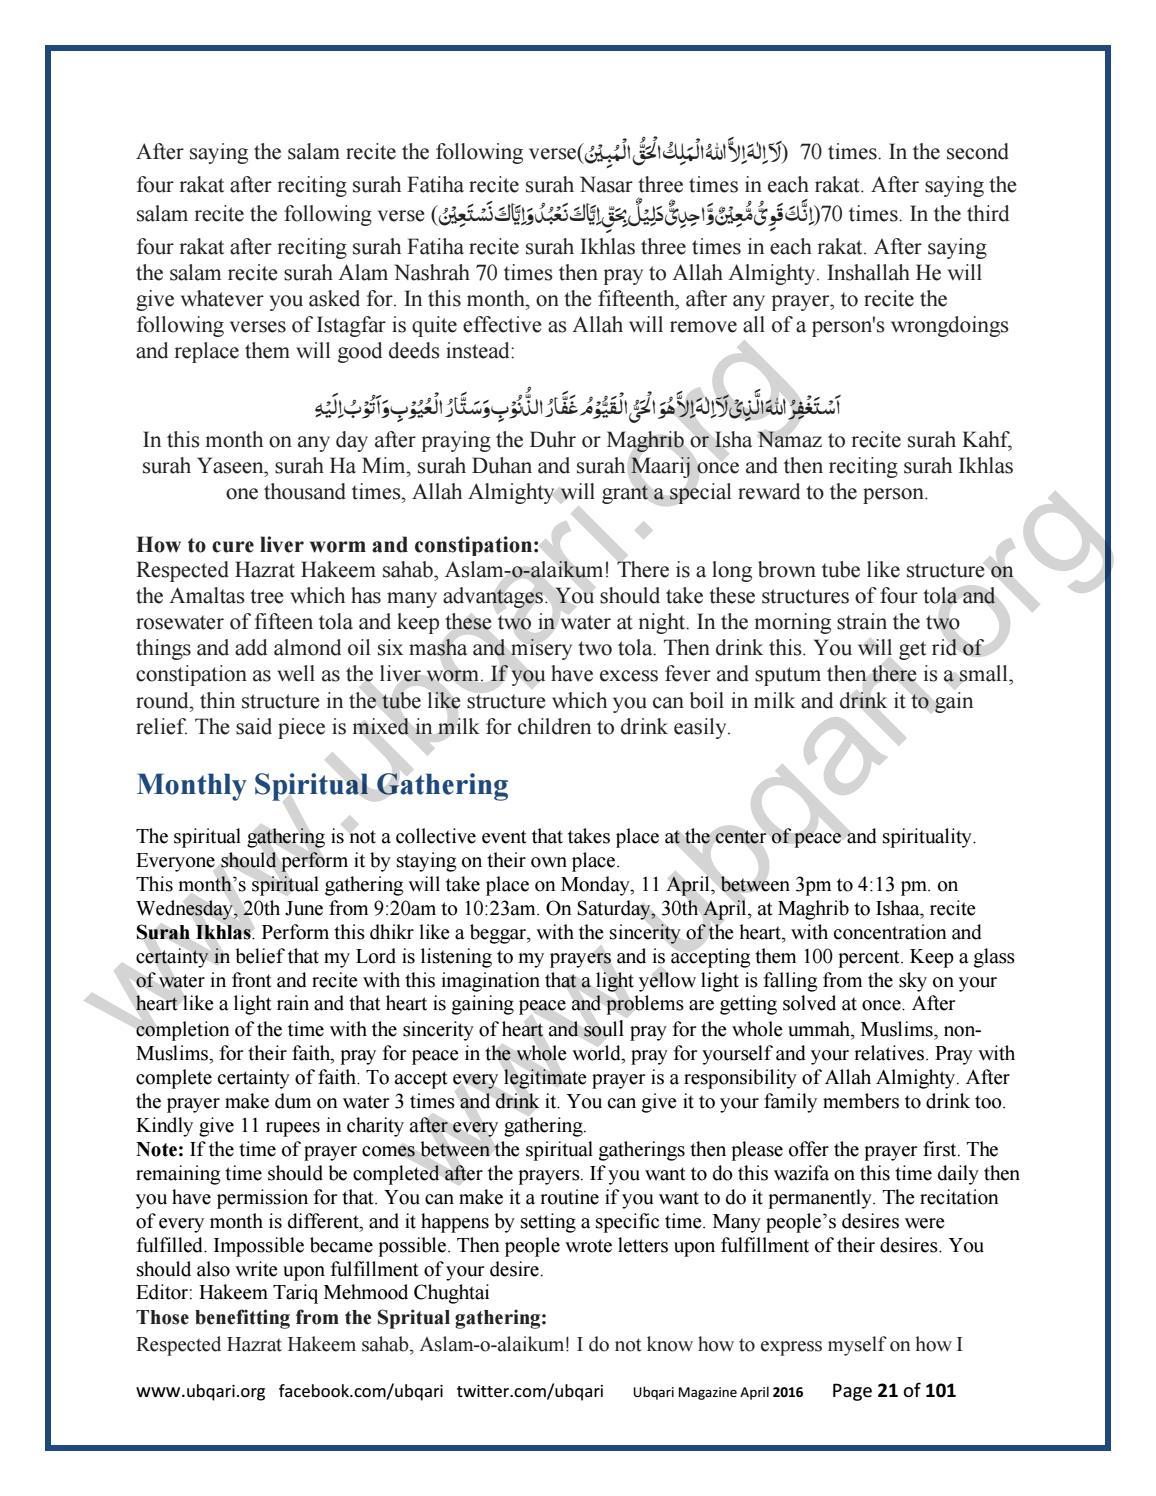 Monthly Ubqari Magazine April 2016 by Ubqari - issuu